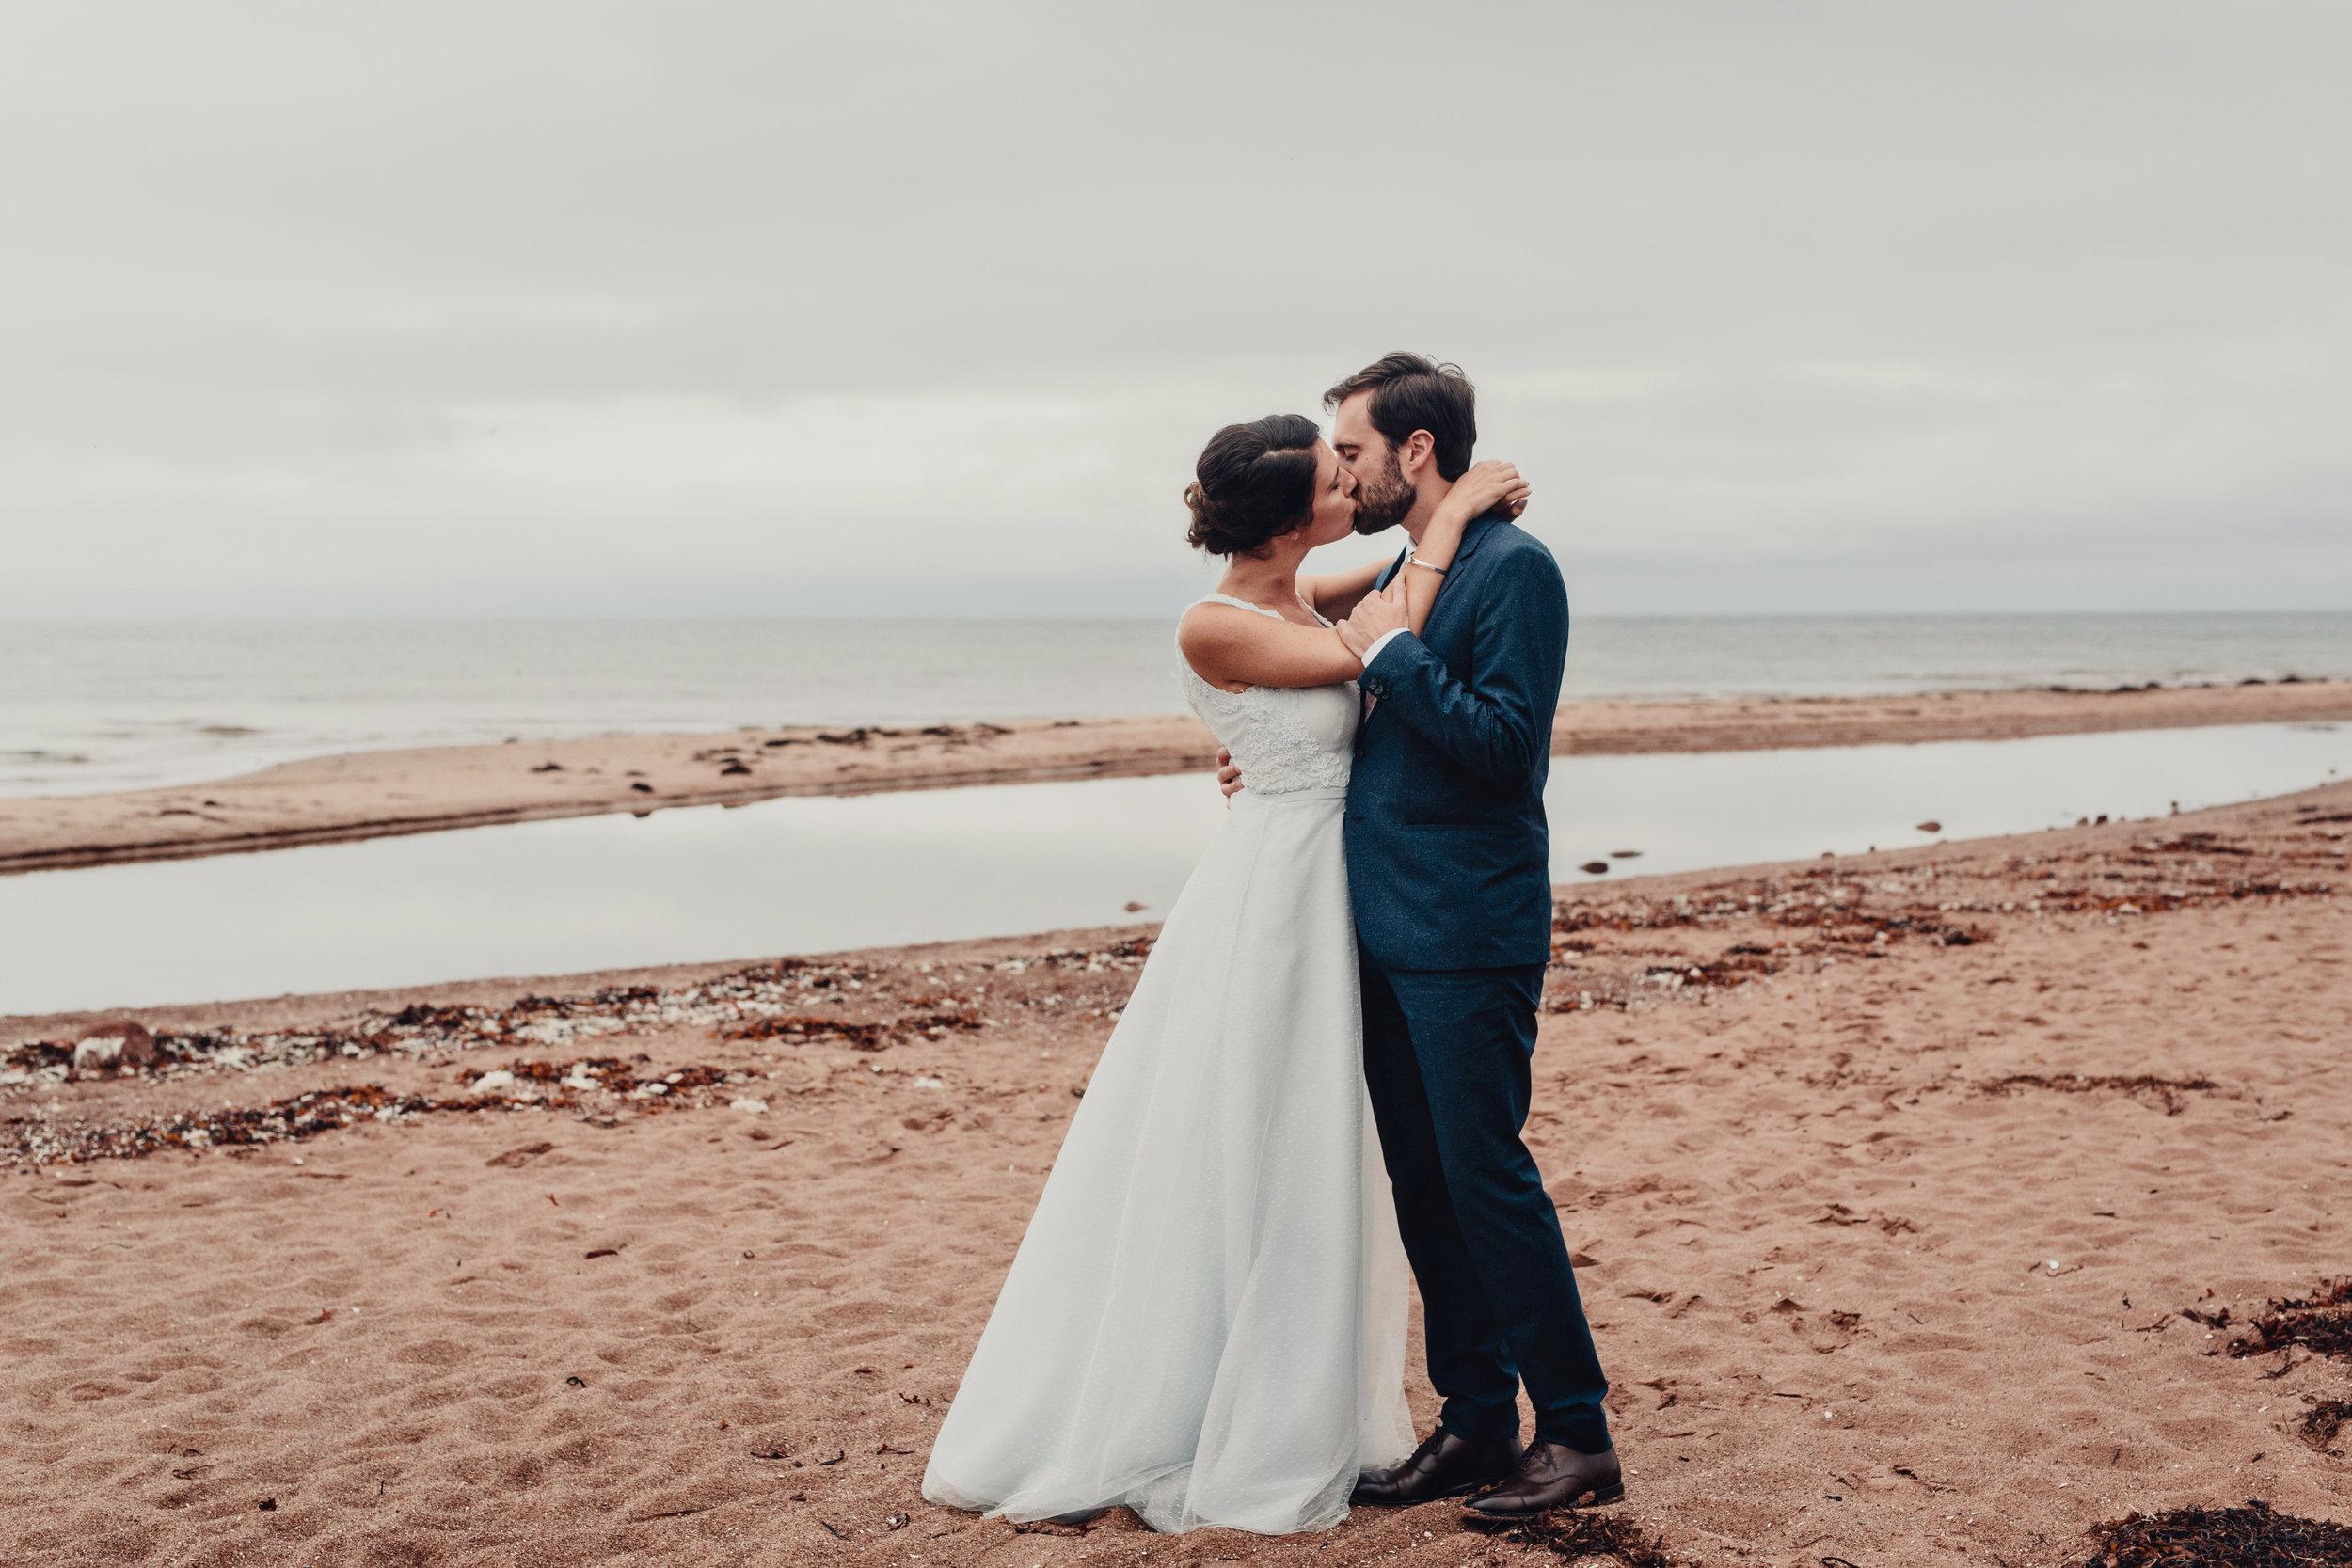 prince-edward-island-cottage-wedding-photos-0059.JPG